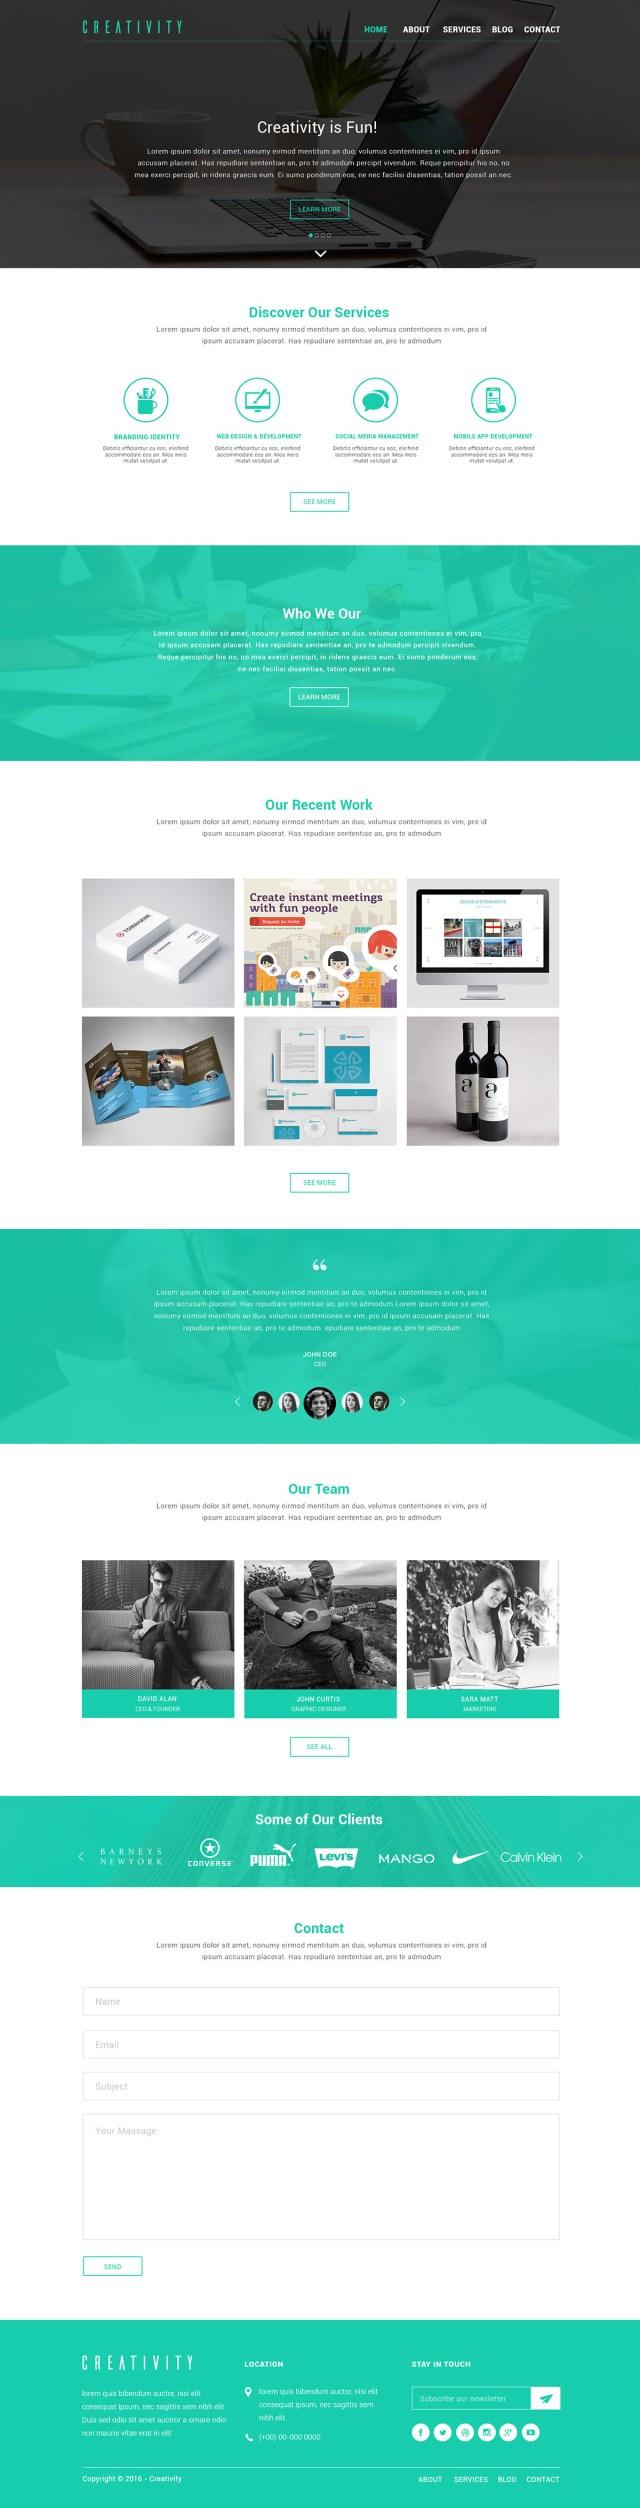 Creativity Design Studio Free PSD